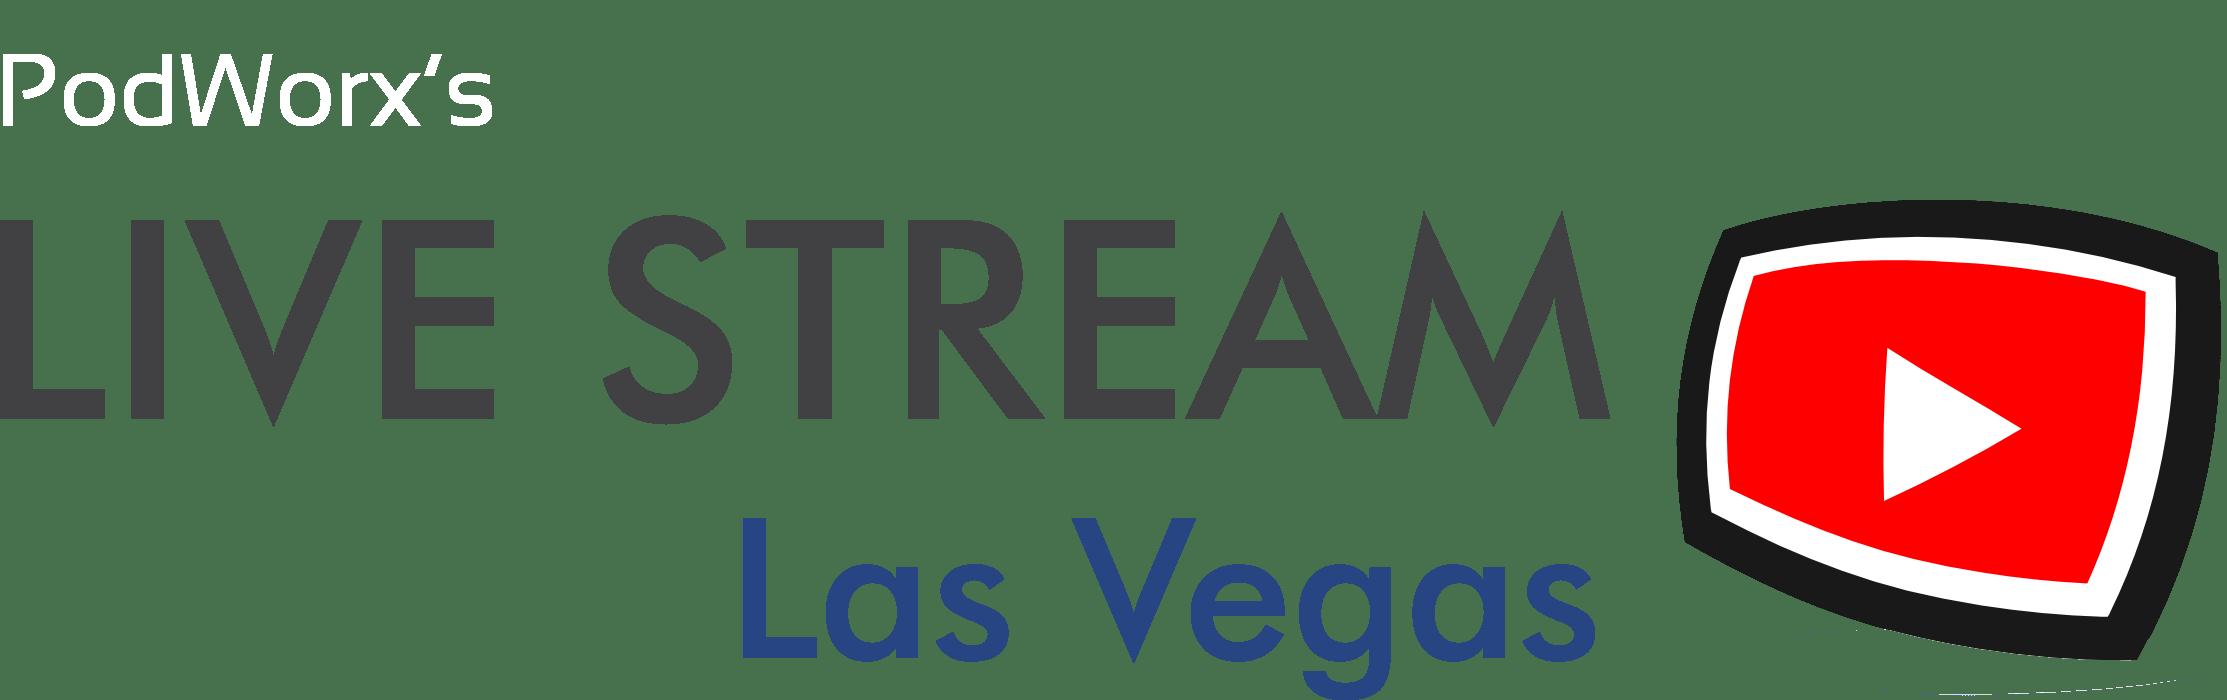 livestream logo wwwpixsharkcom images galleries with